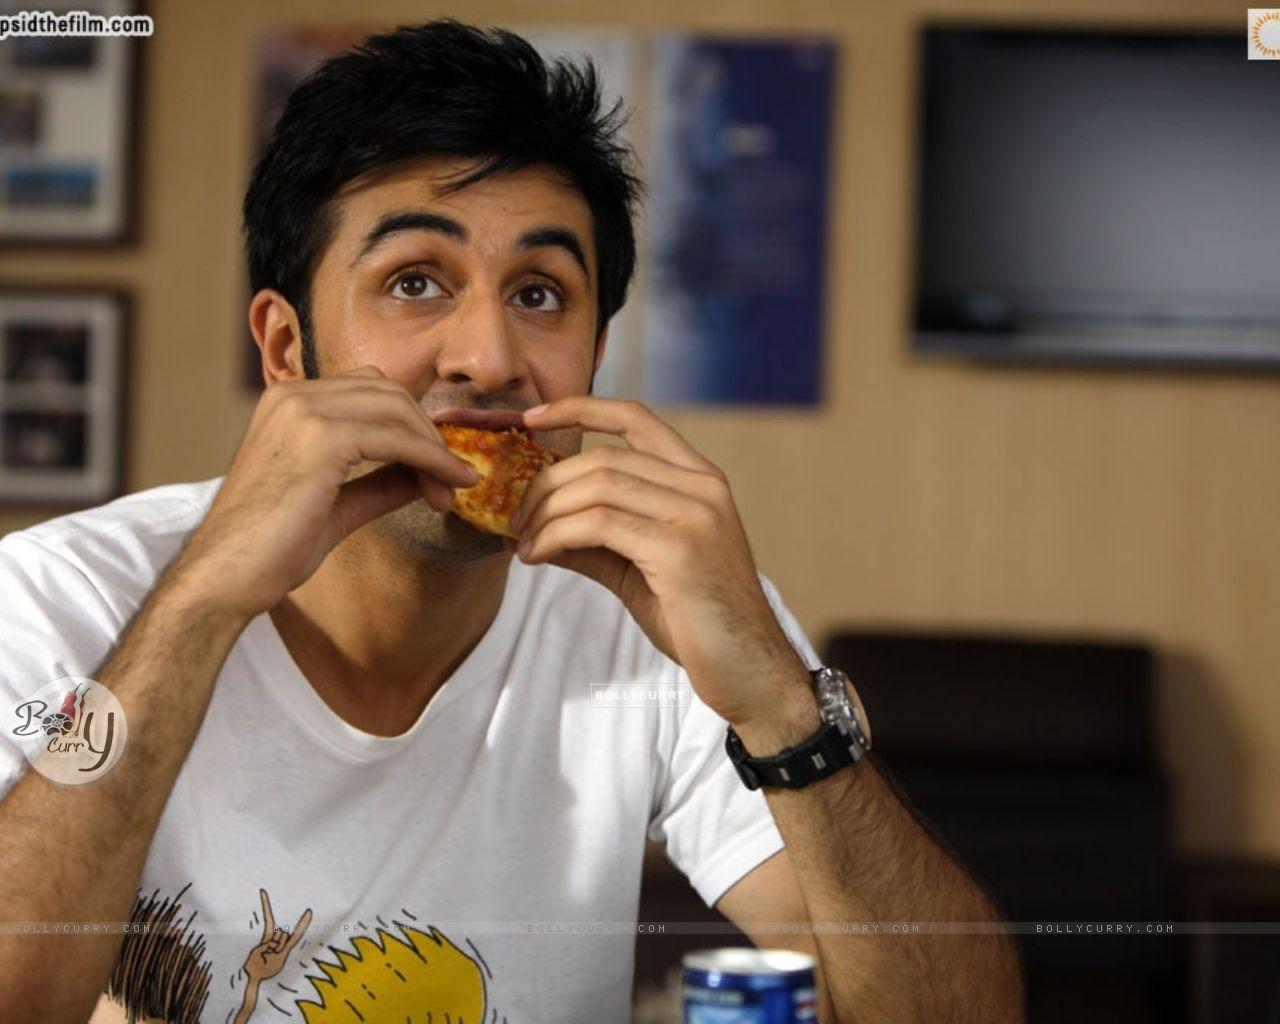 ranbir kapoor eating pizza (37860) size:1280x1024